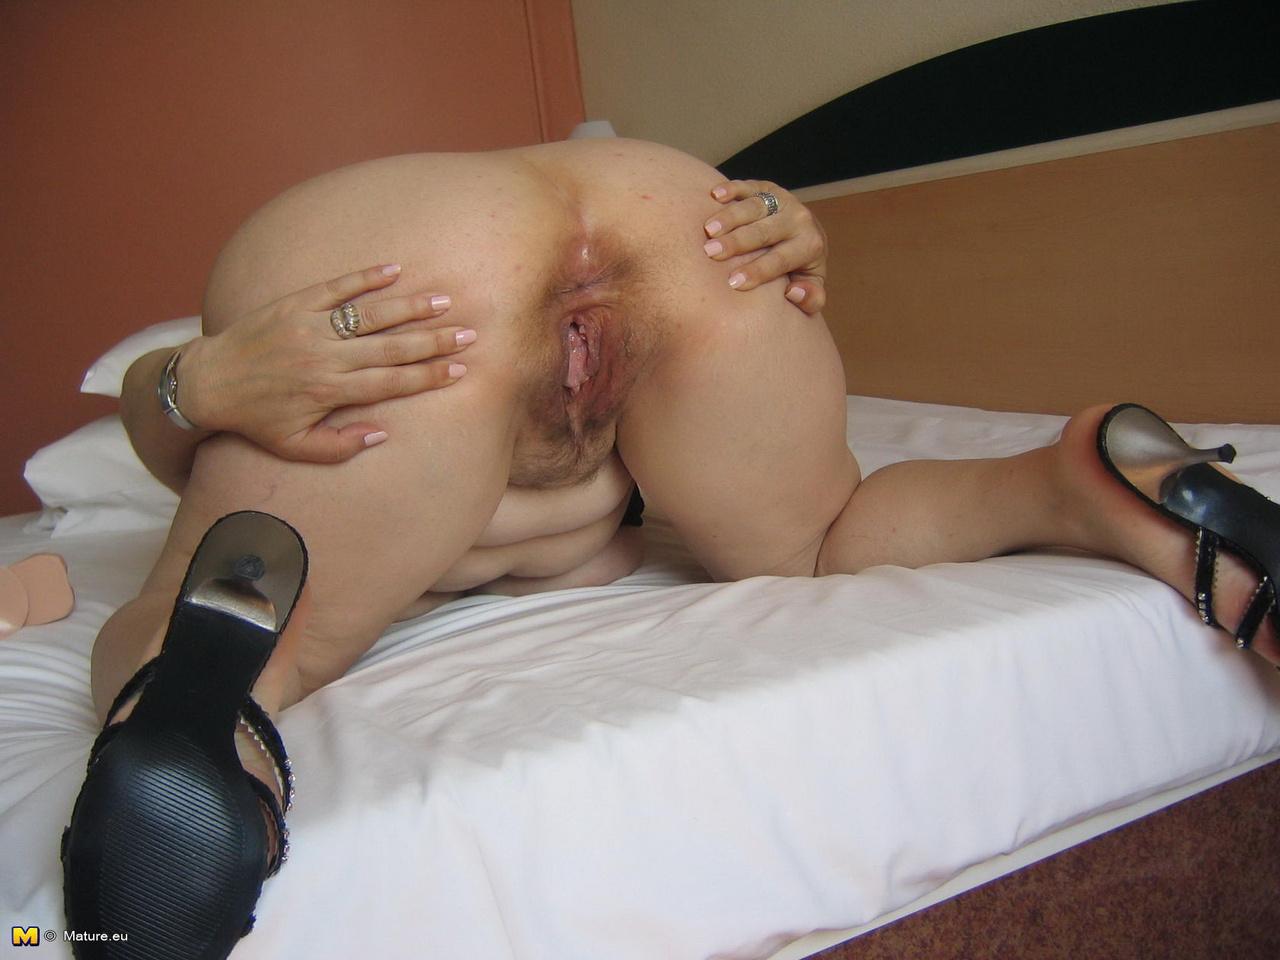 porno-fotografii-zhenshin-sostoyashih-rakom